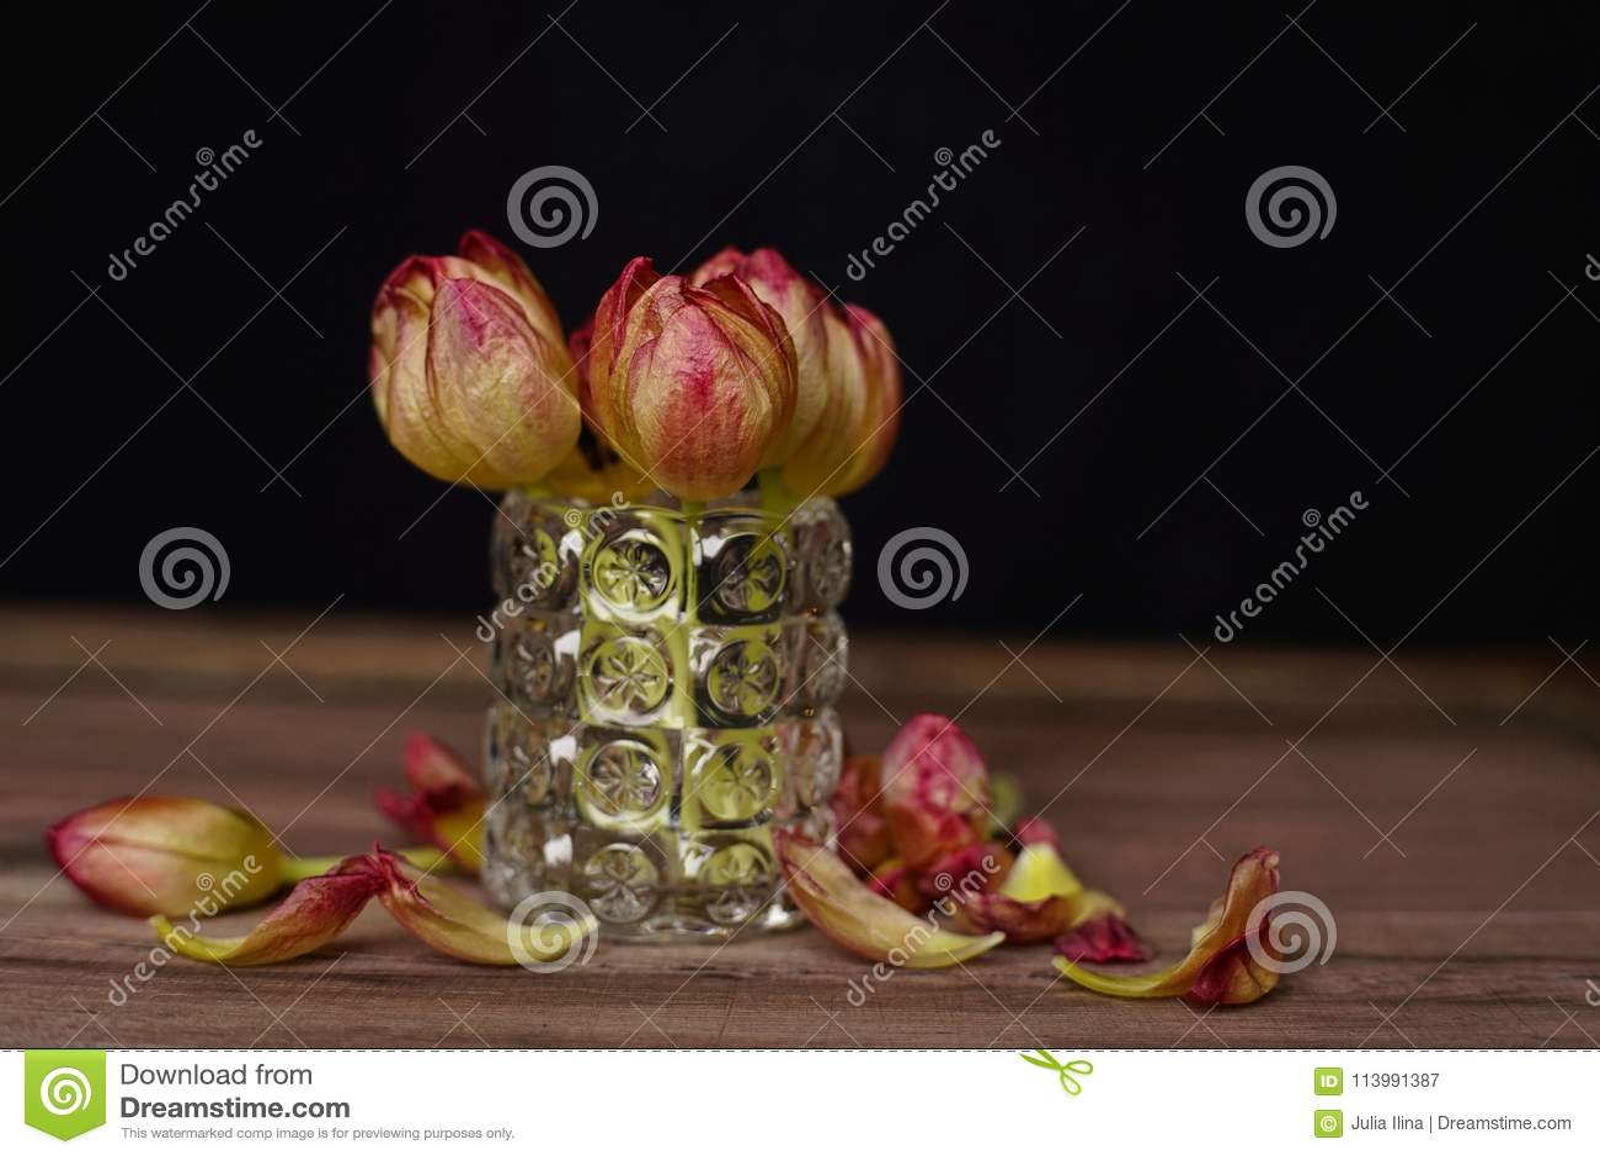 tulips flowers vase black background wood table close-up